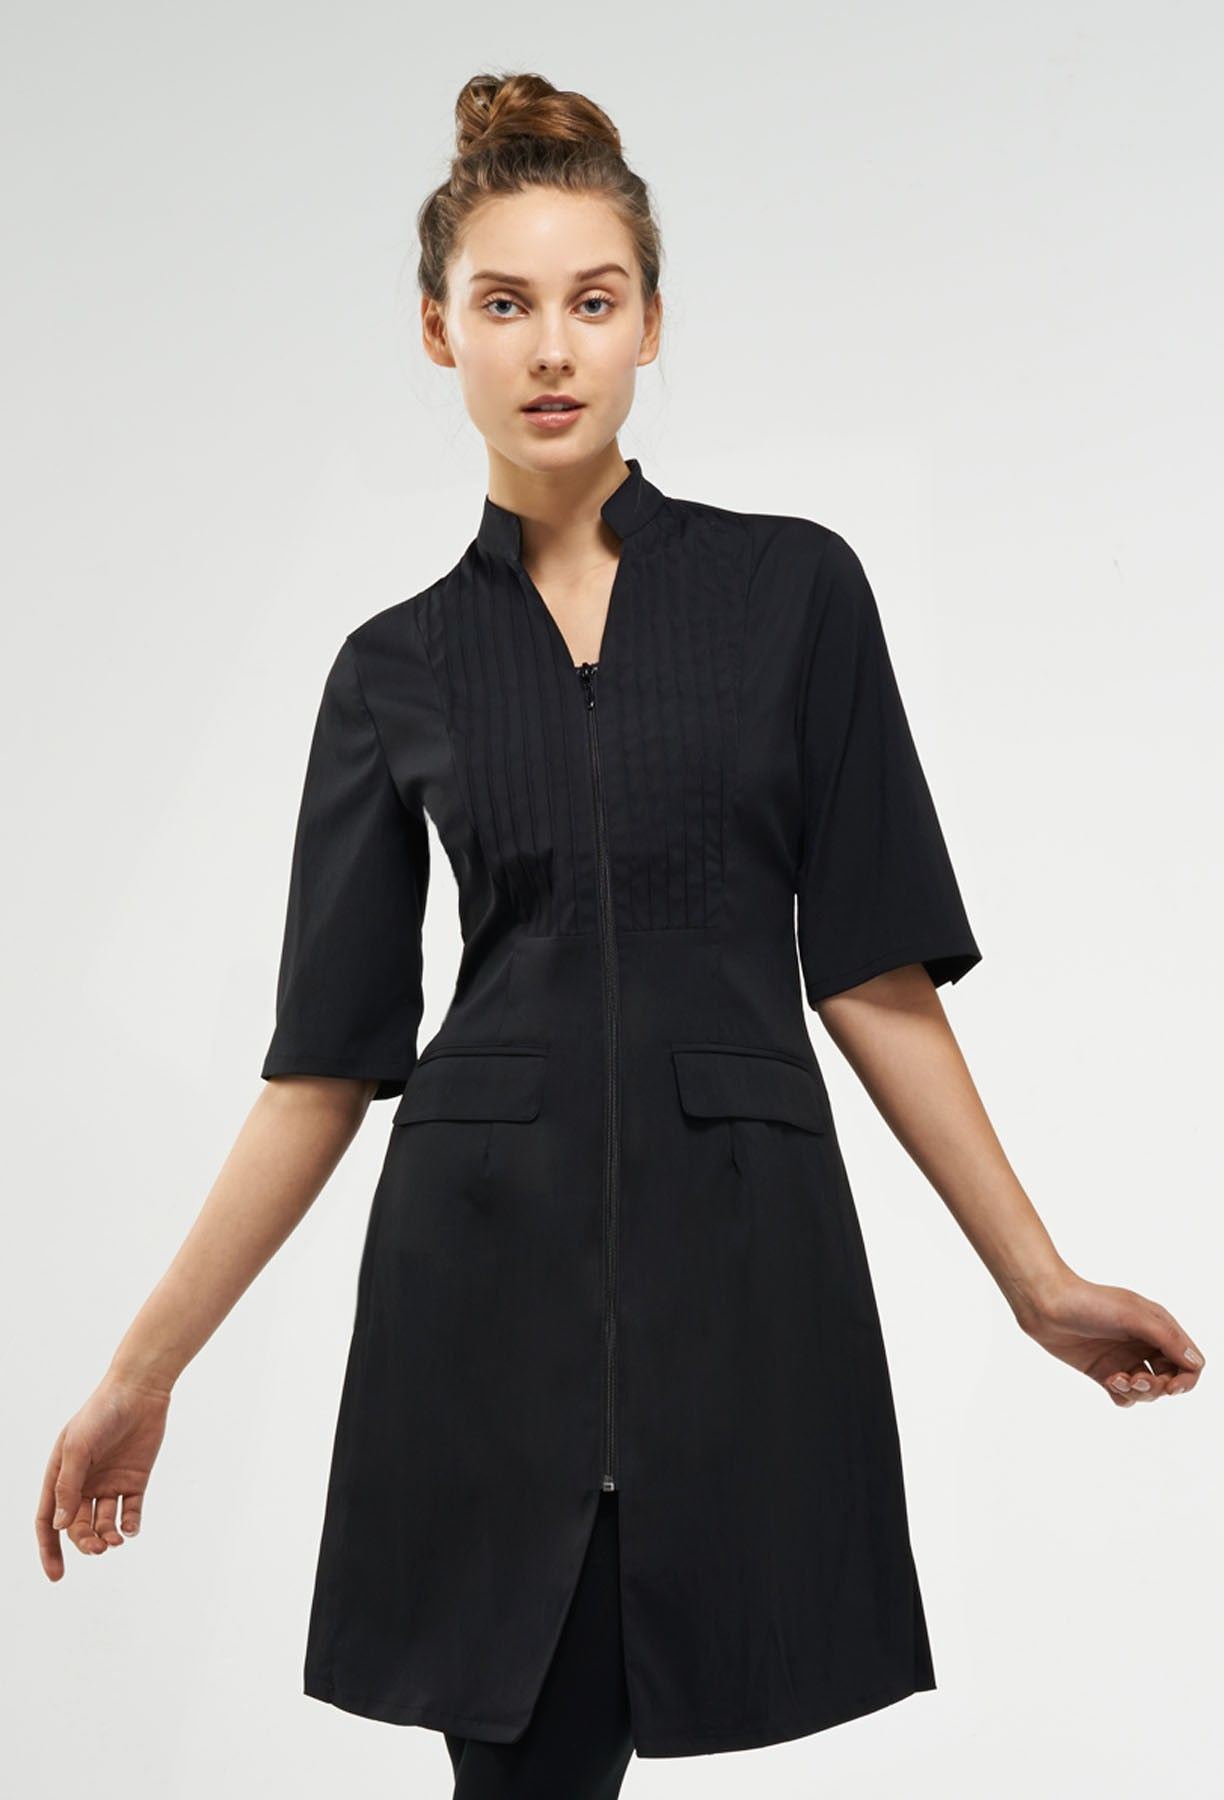 Moderna work outfit spa uniform beauty uniforms fashion for Spa worker uniform